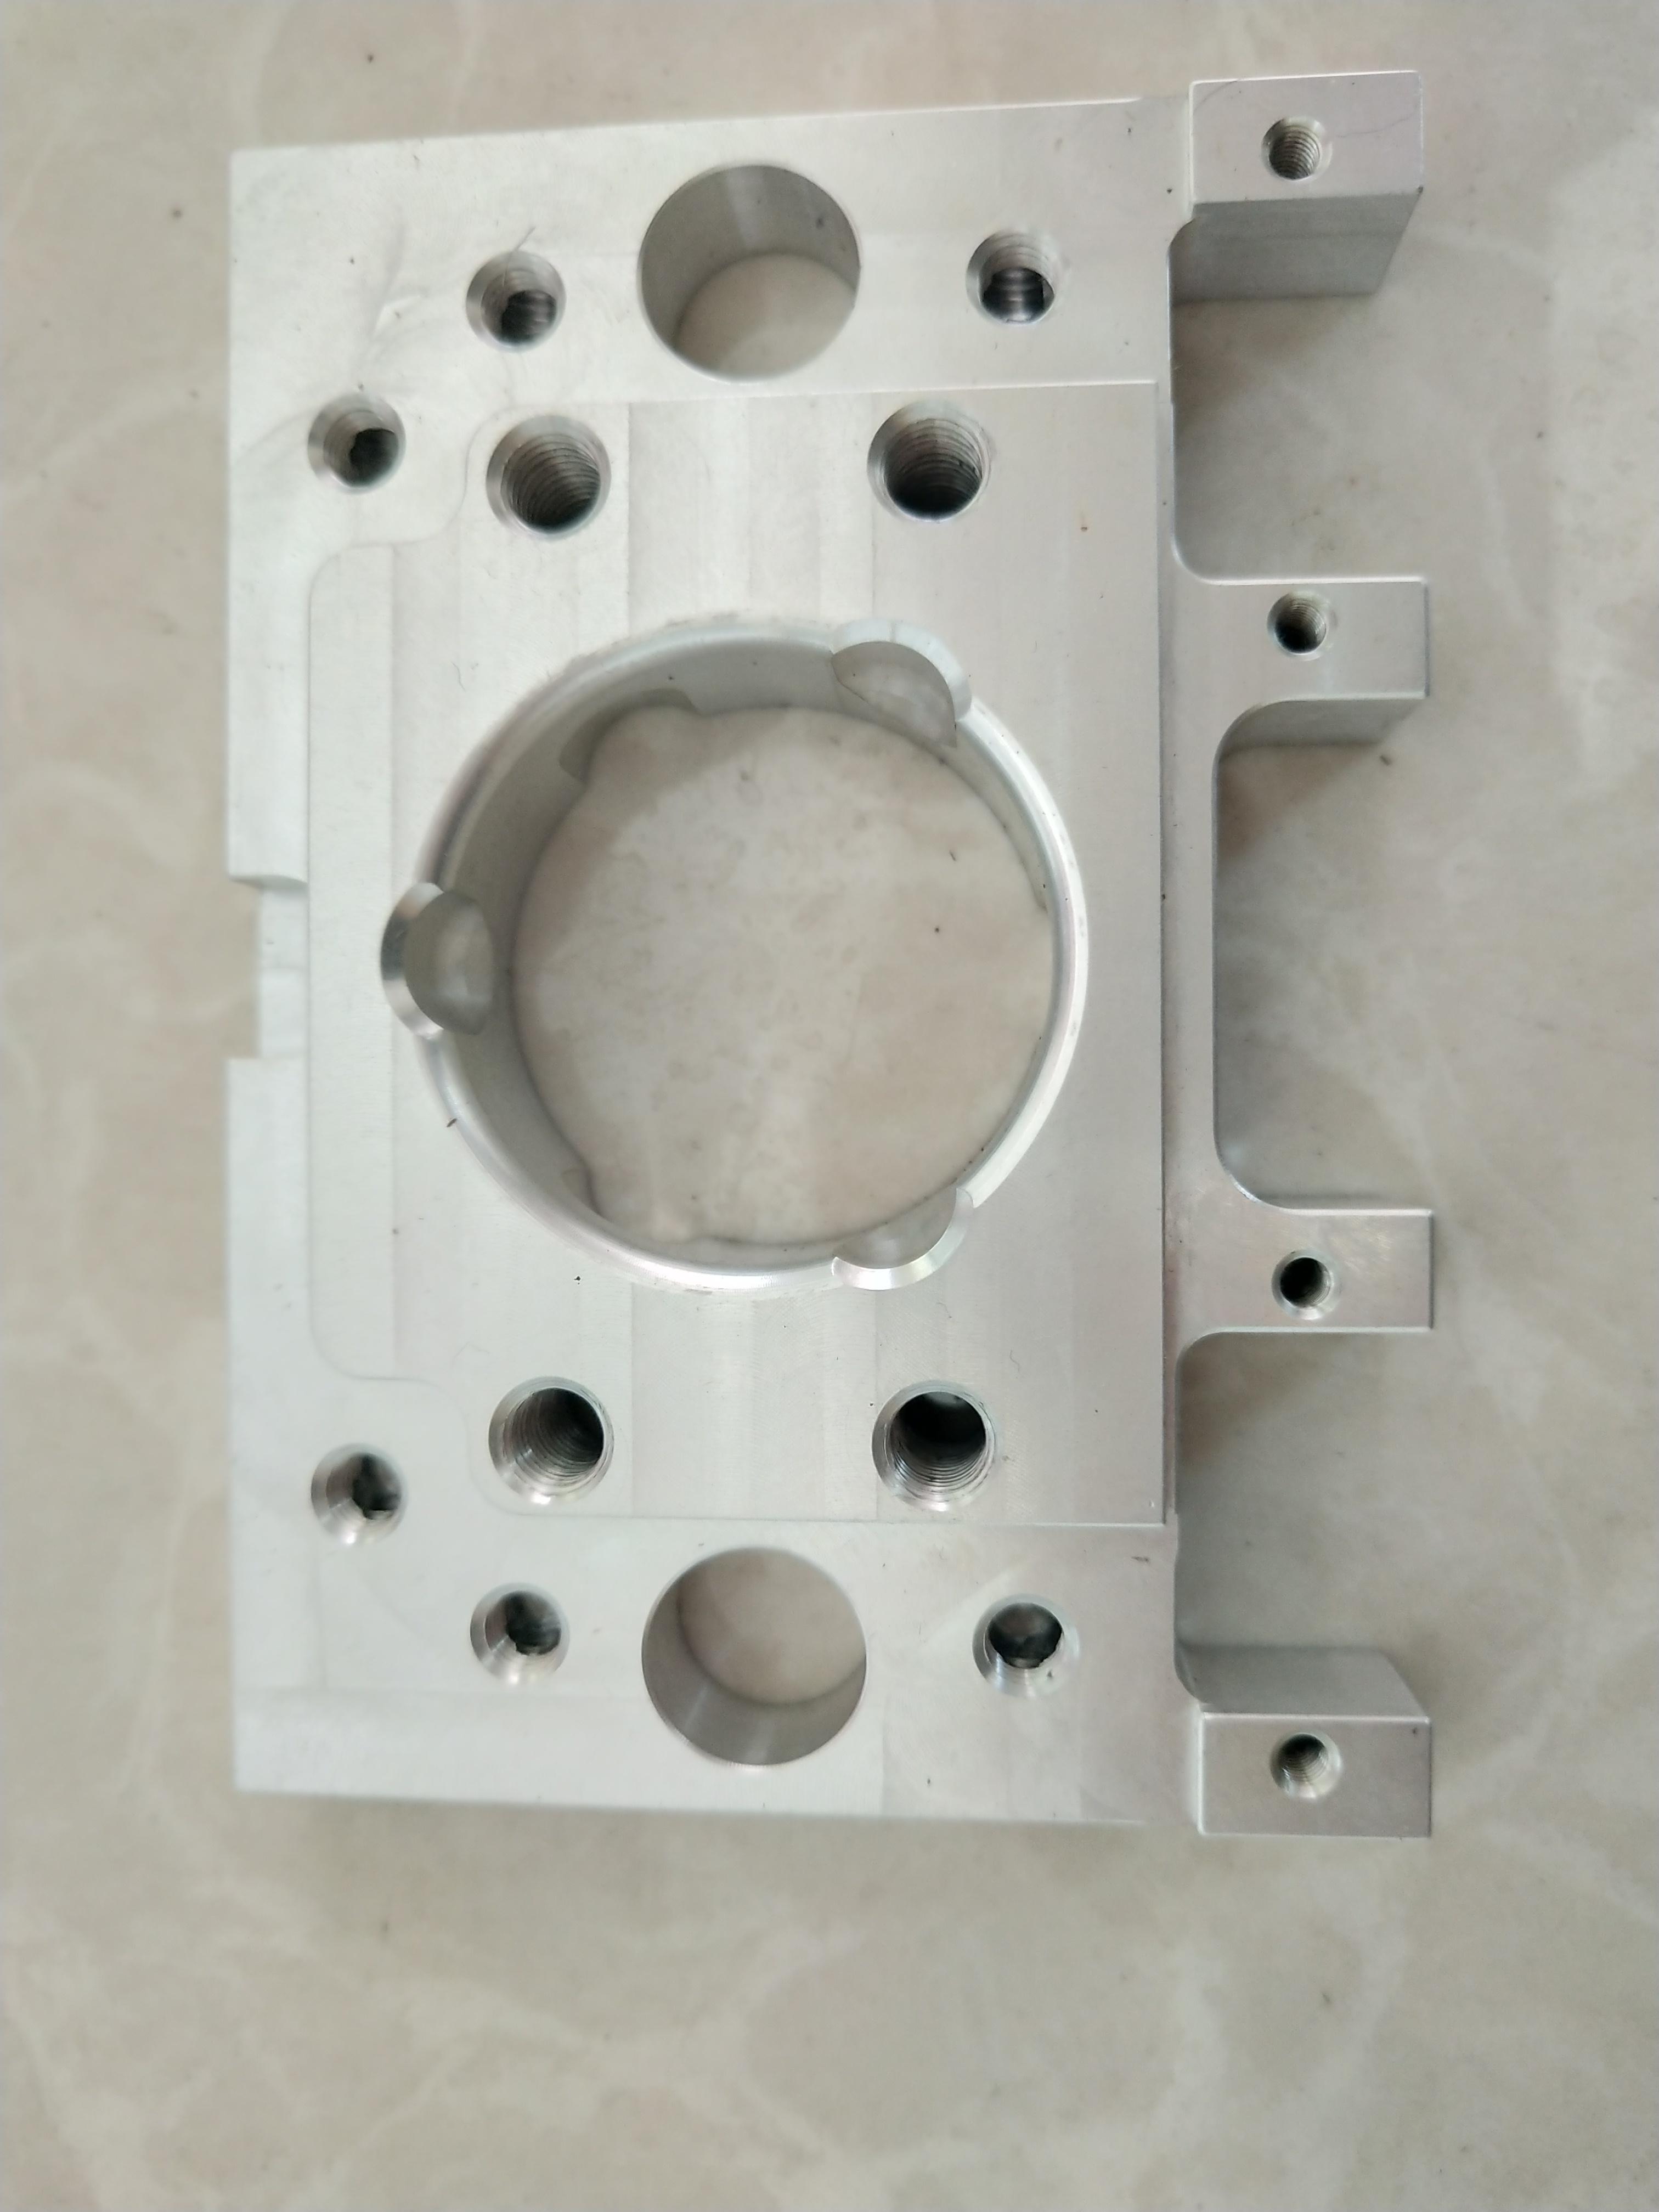 CNC产品加工厂家批发供应CNC产品加工 五金模具零件加工 精密模具厂家 CNC数控自动化机床